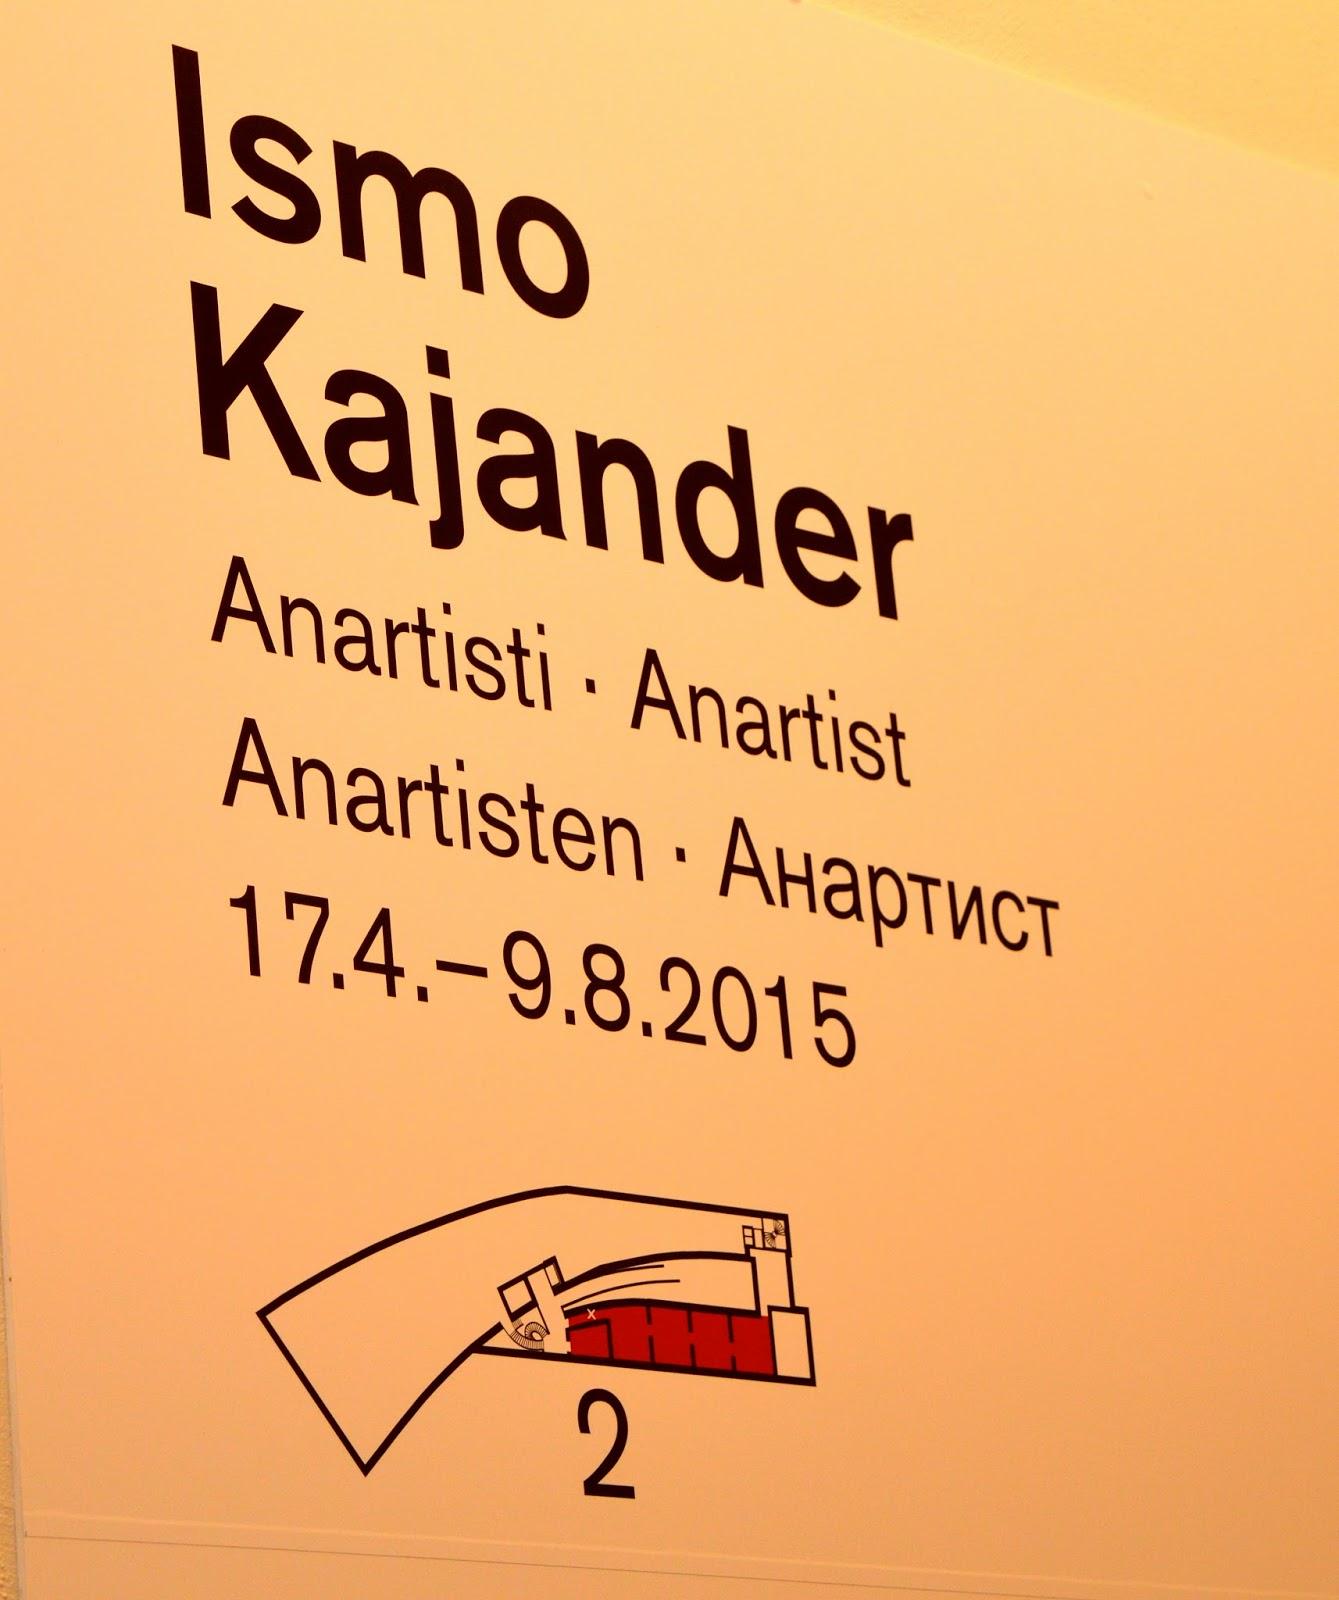 Ismo Kajander Anartisti